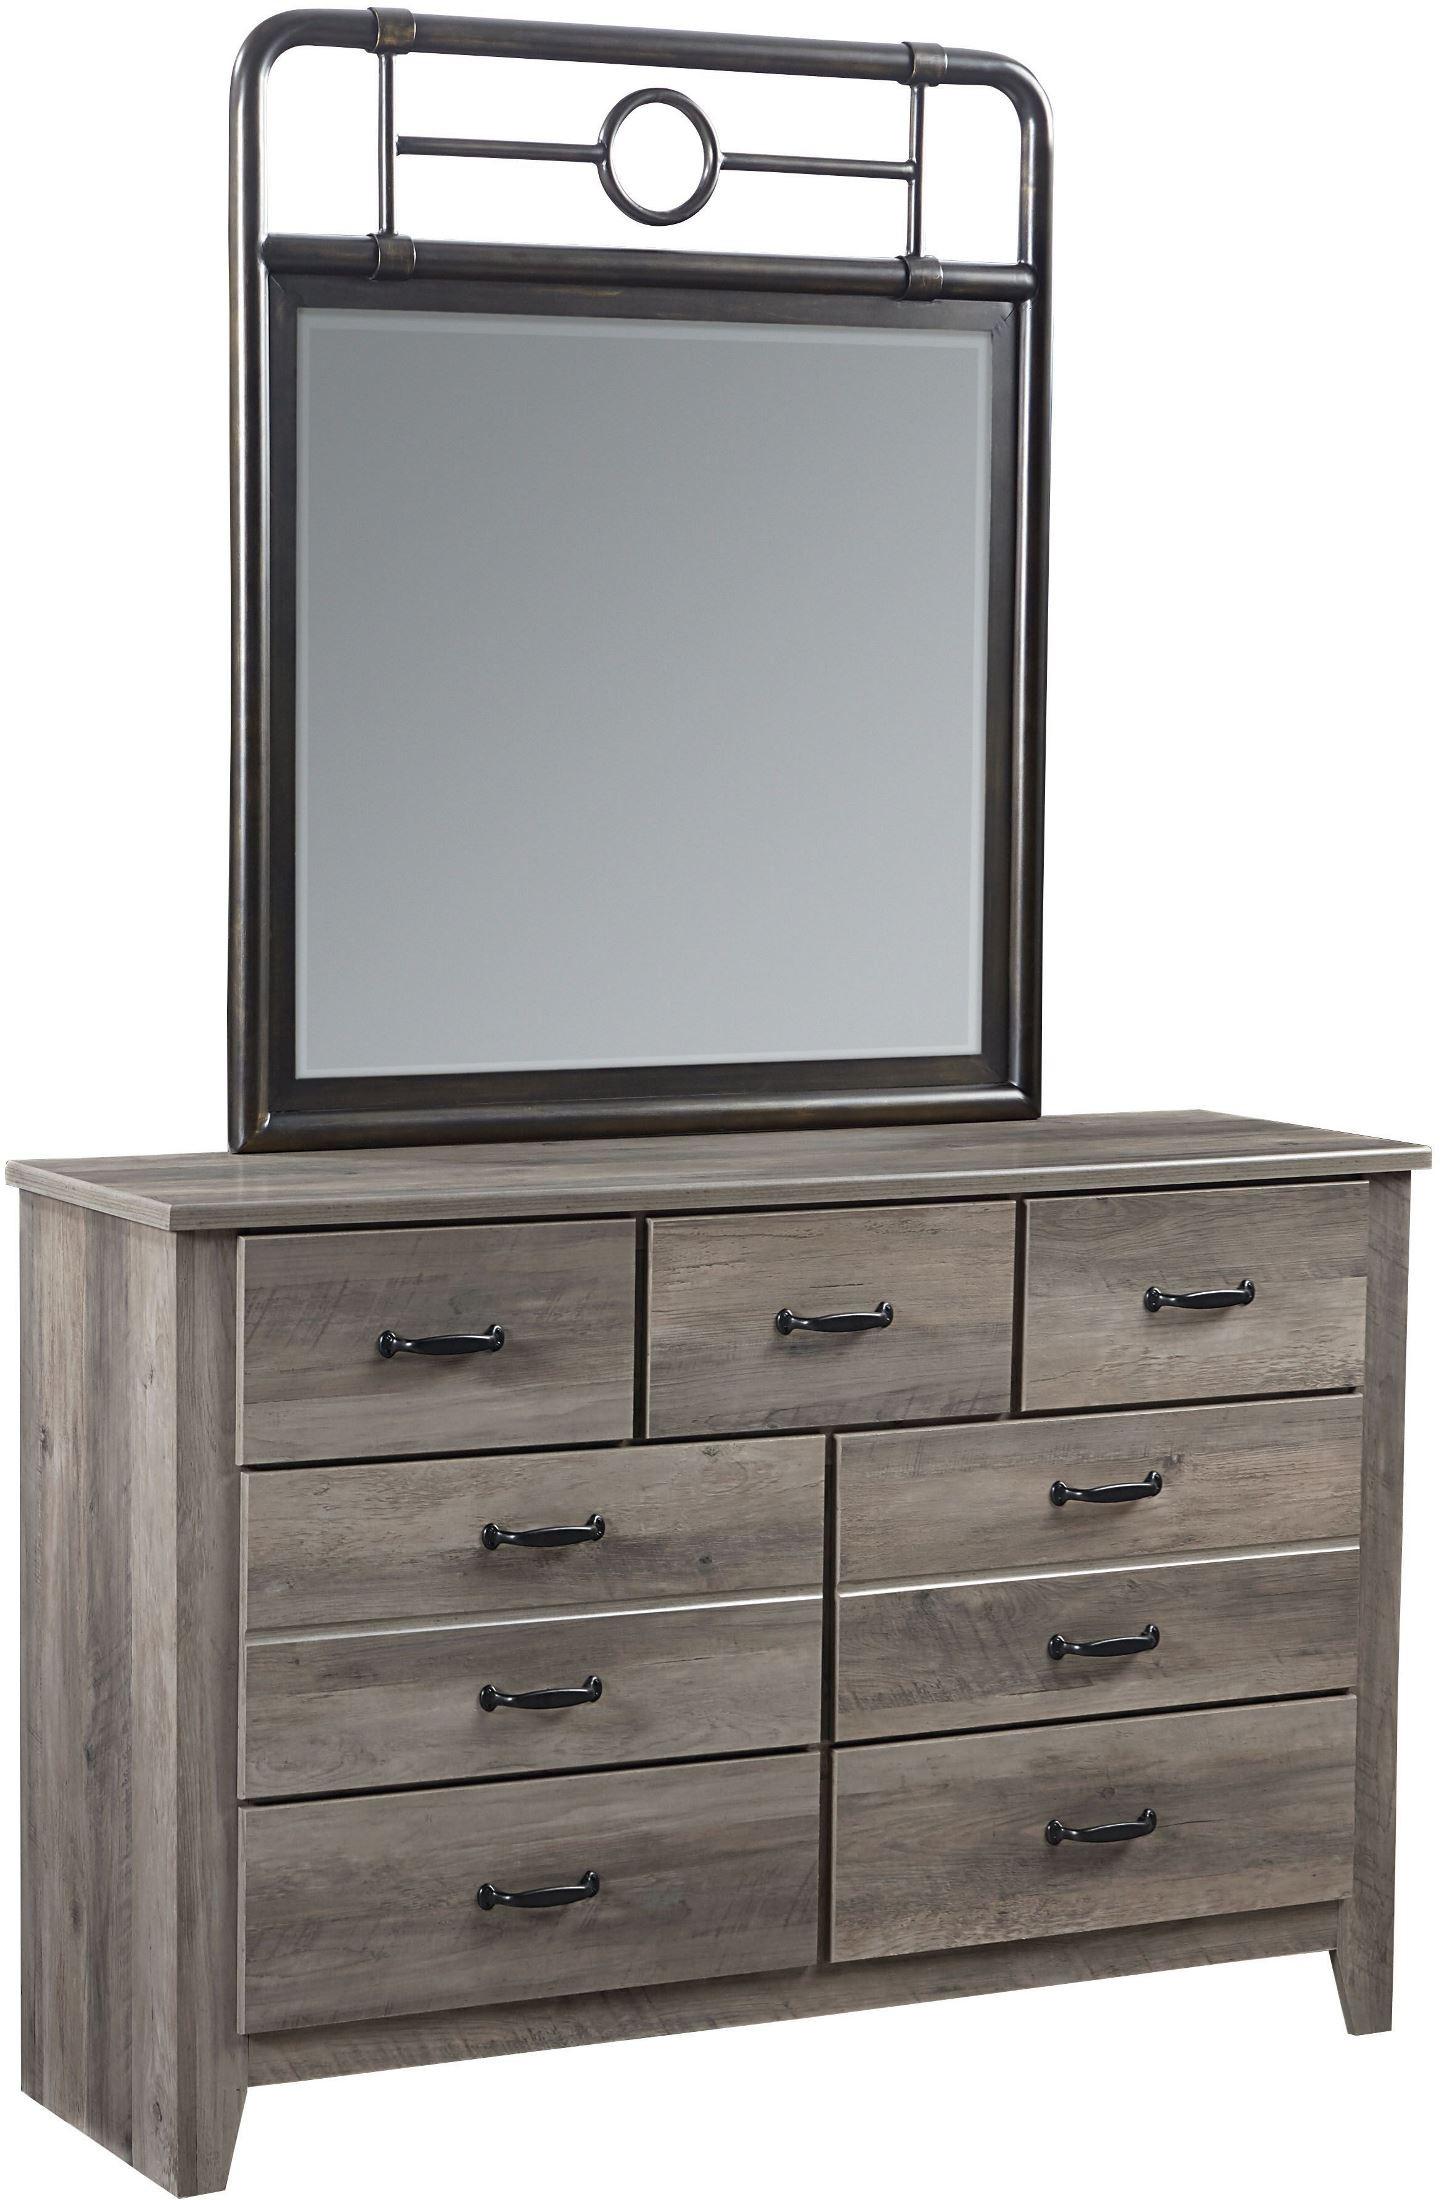 Barnett Distressed Pine Youth Metal Bedroom Set 62403 62410 Standard Furniture